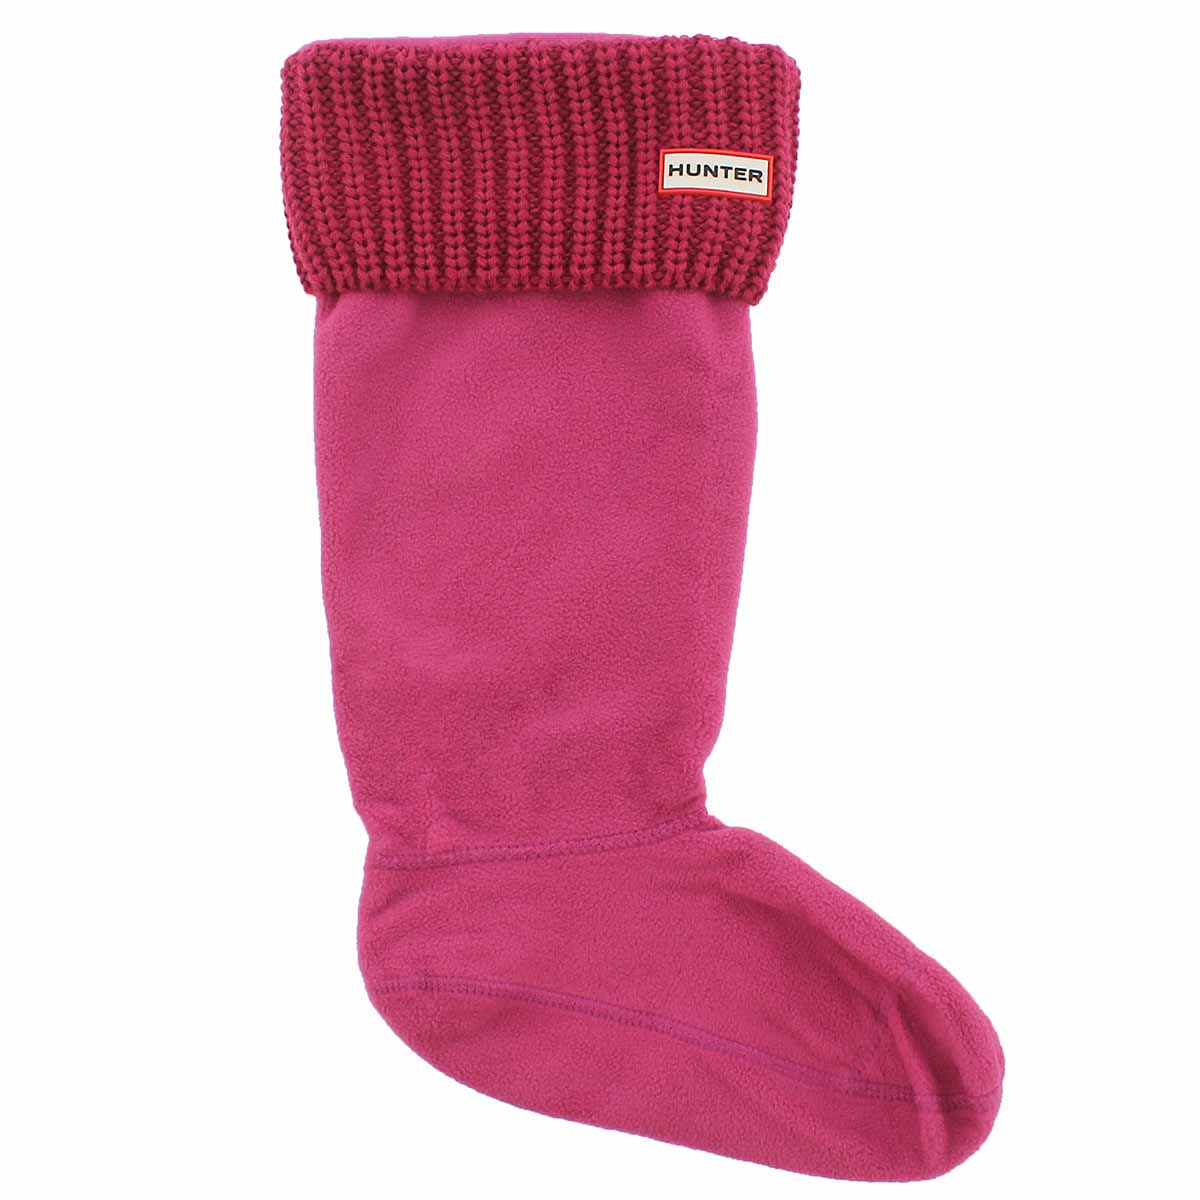 Lds Half Cardigan pink boot sock